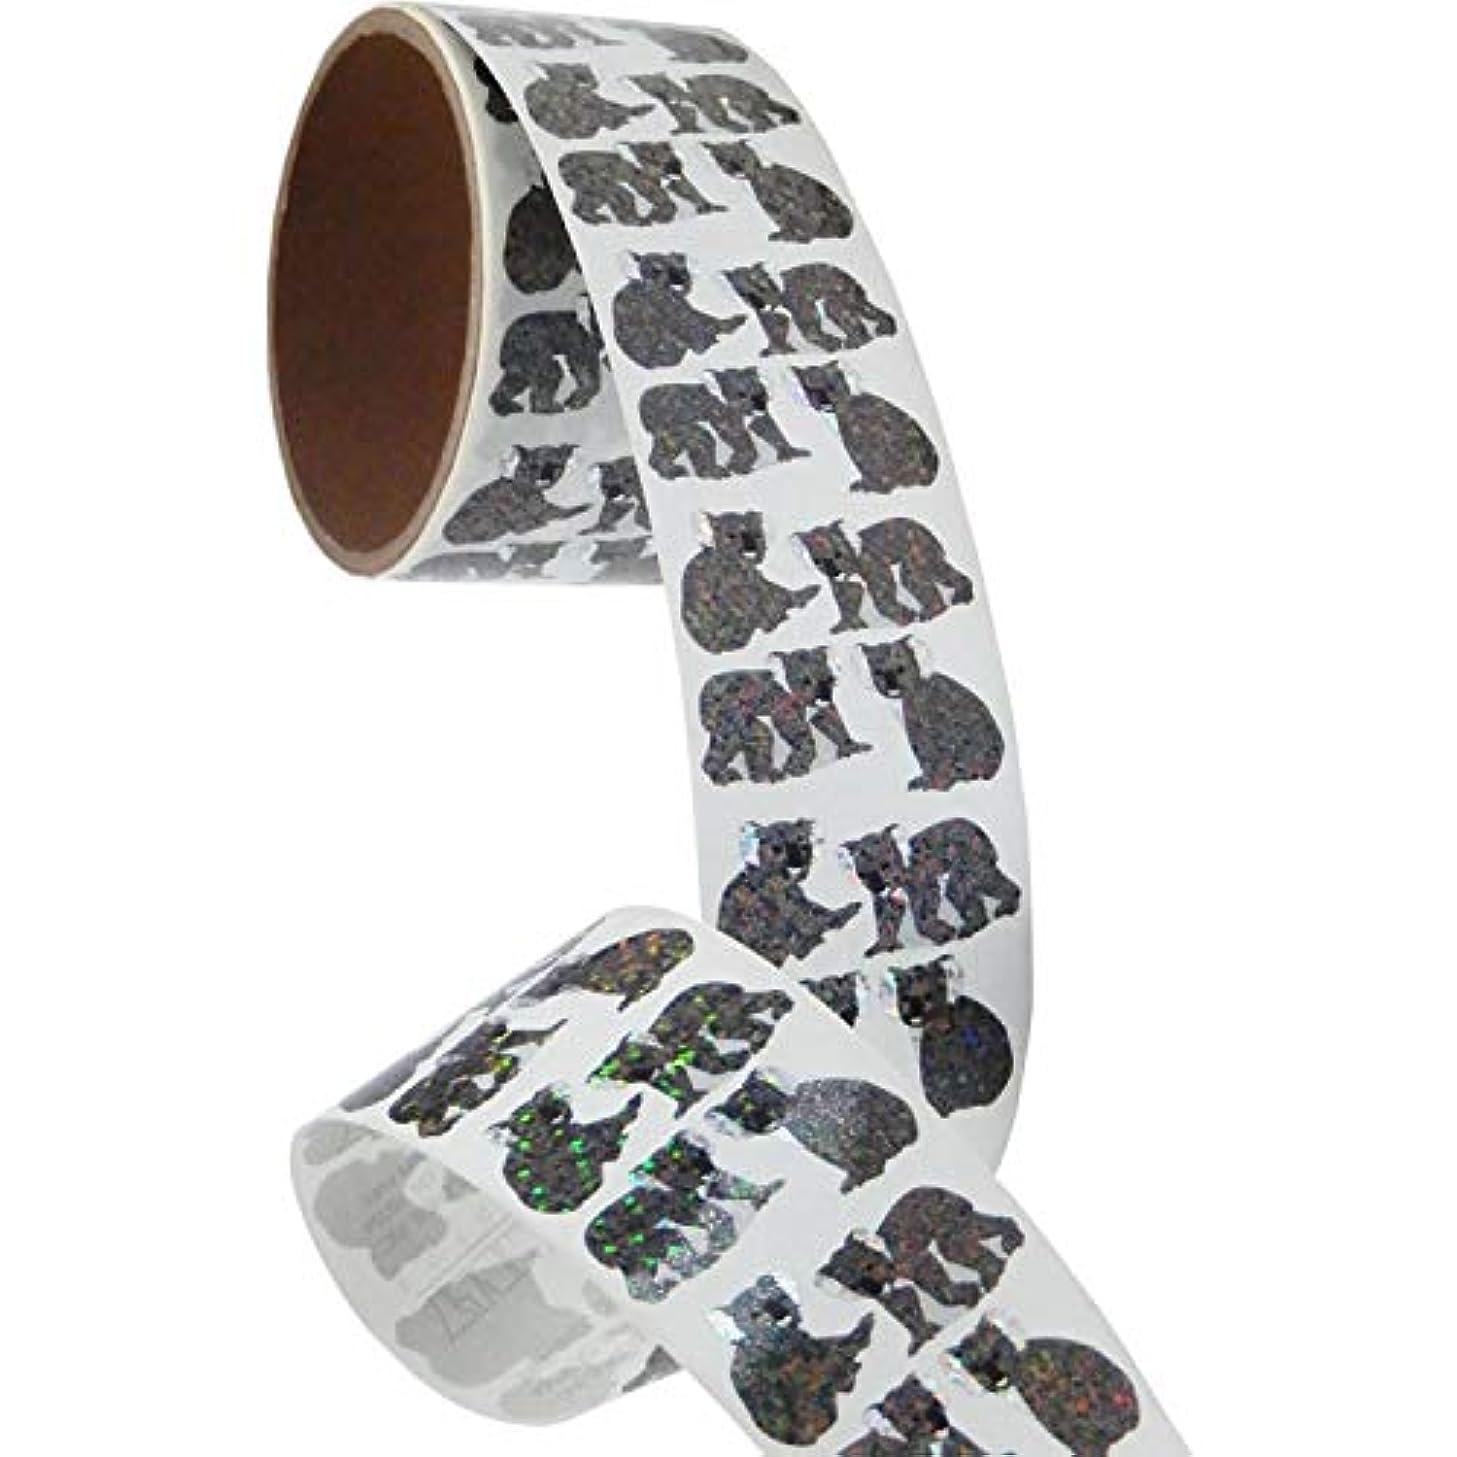 Bulk Roll Prismatic Stickers, Mini Koala Bears (100 Repeats)